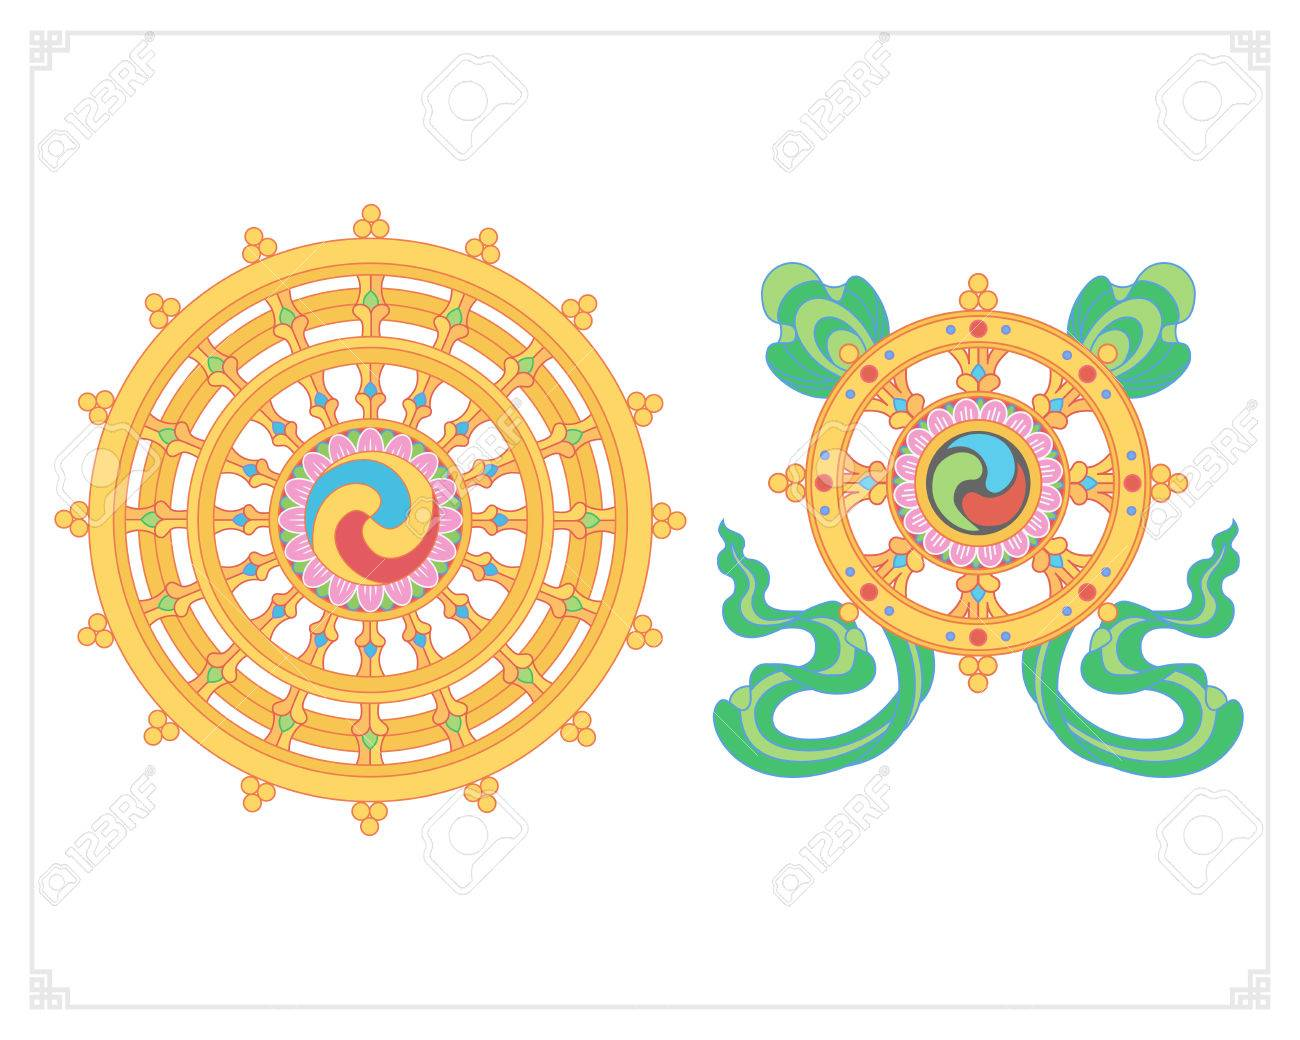 Dharma wheel dharmachakra icons wheel of dharma in flat design dharma wheel dharmachakra icons wheel of dharma in flat design buddhism symbols biocorpaavc Gallery